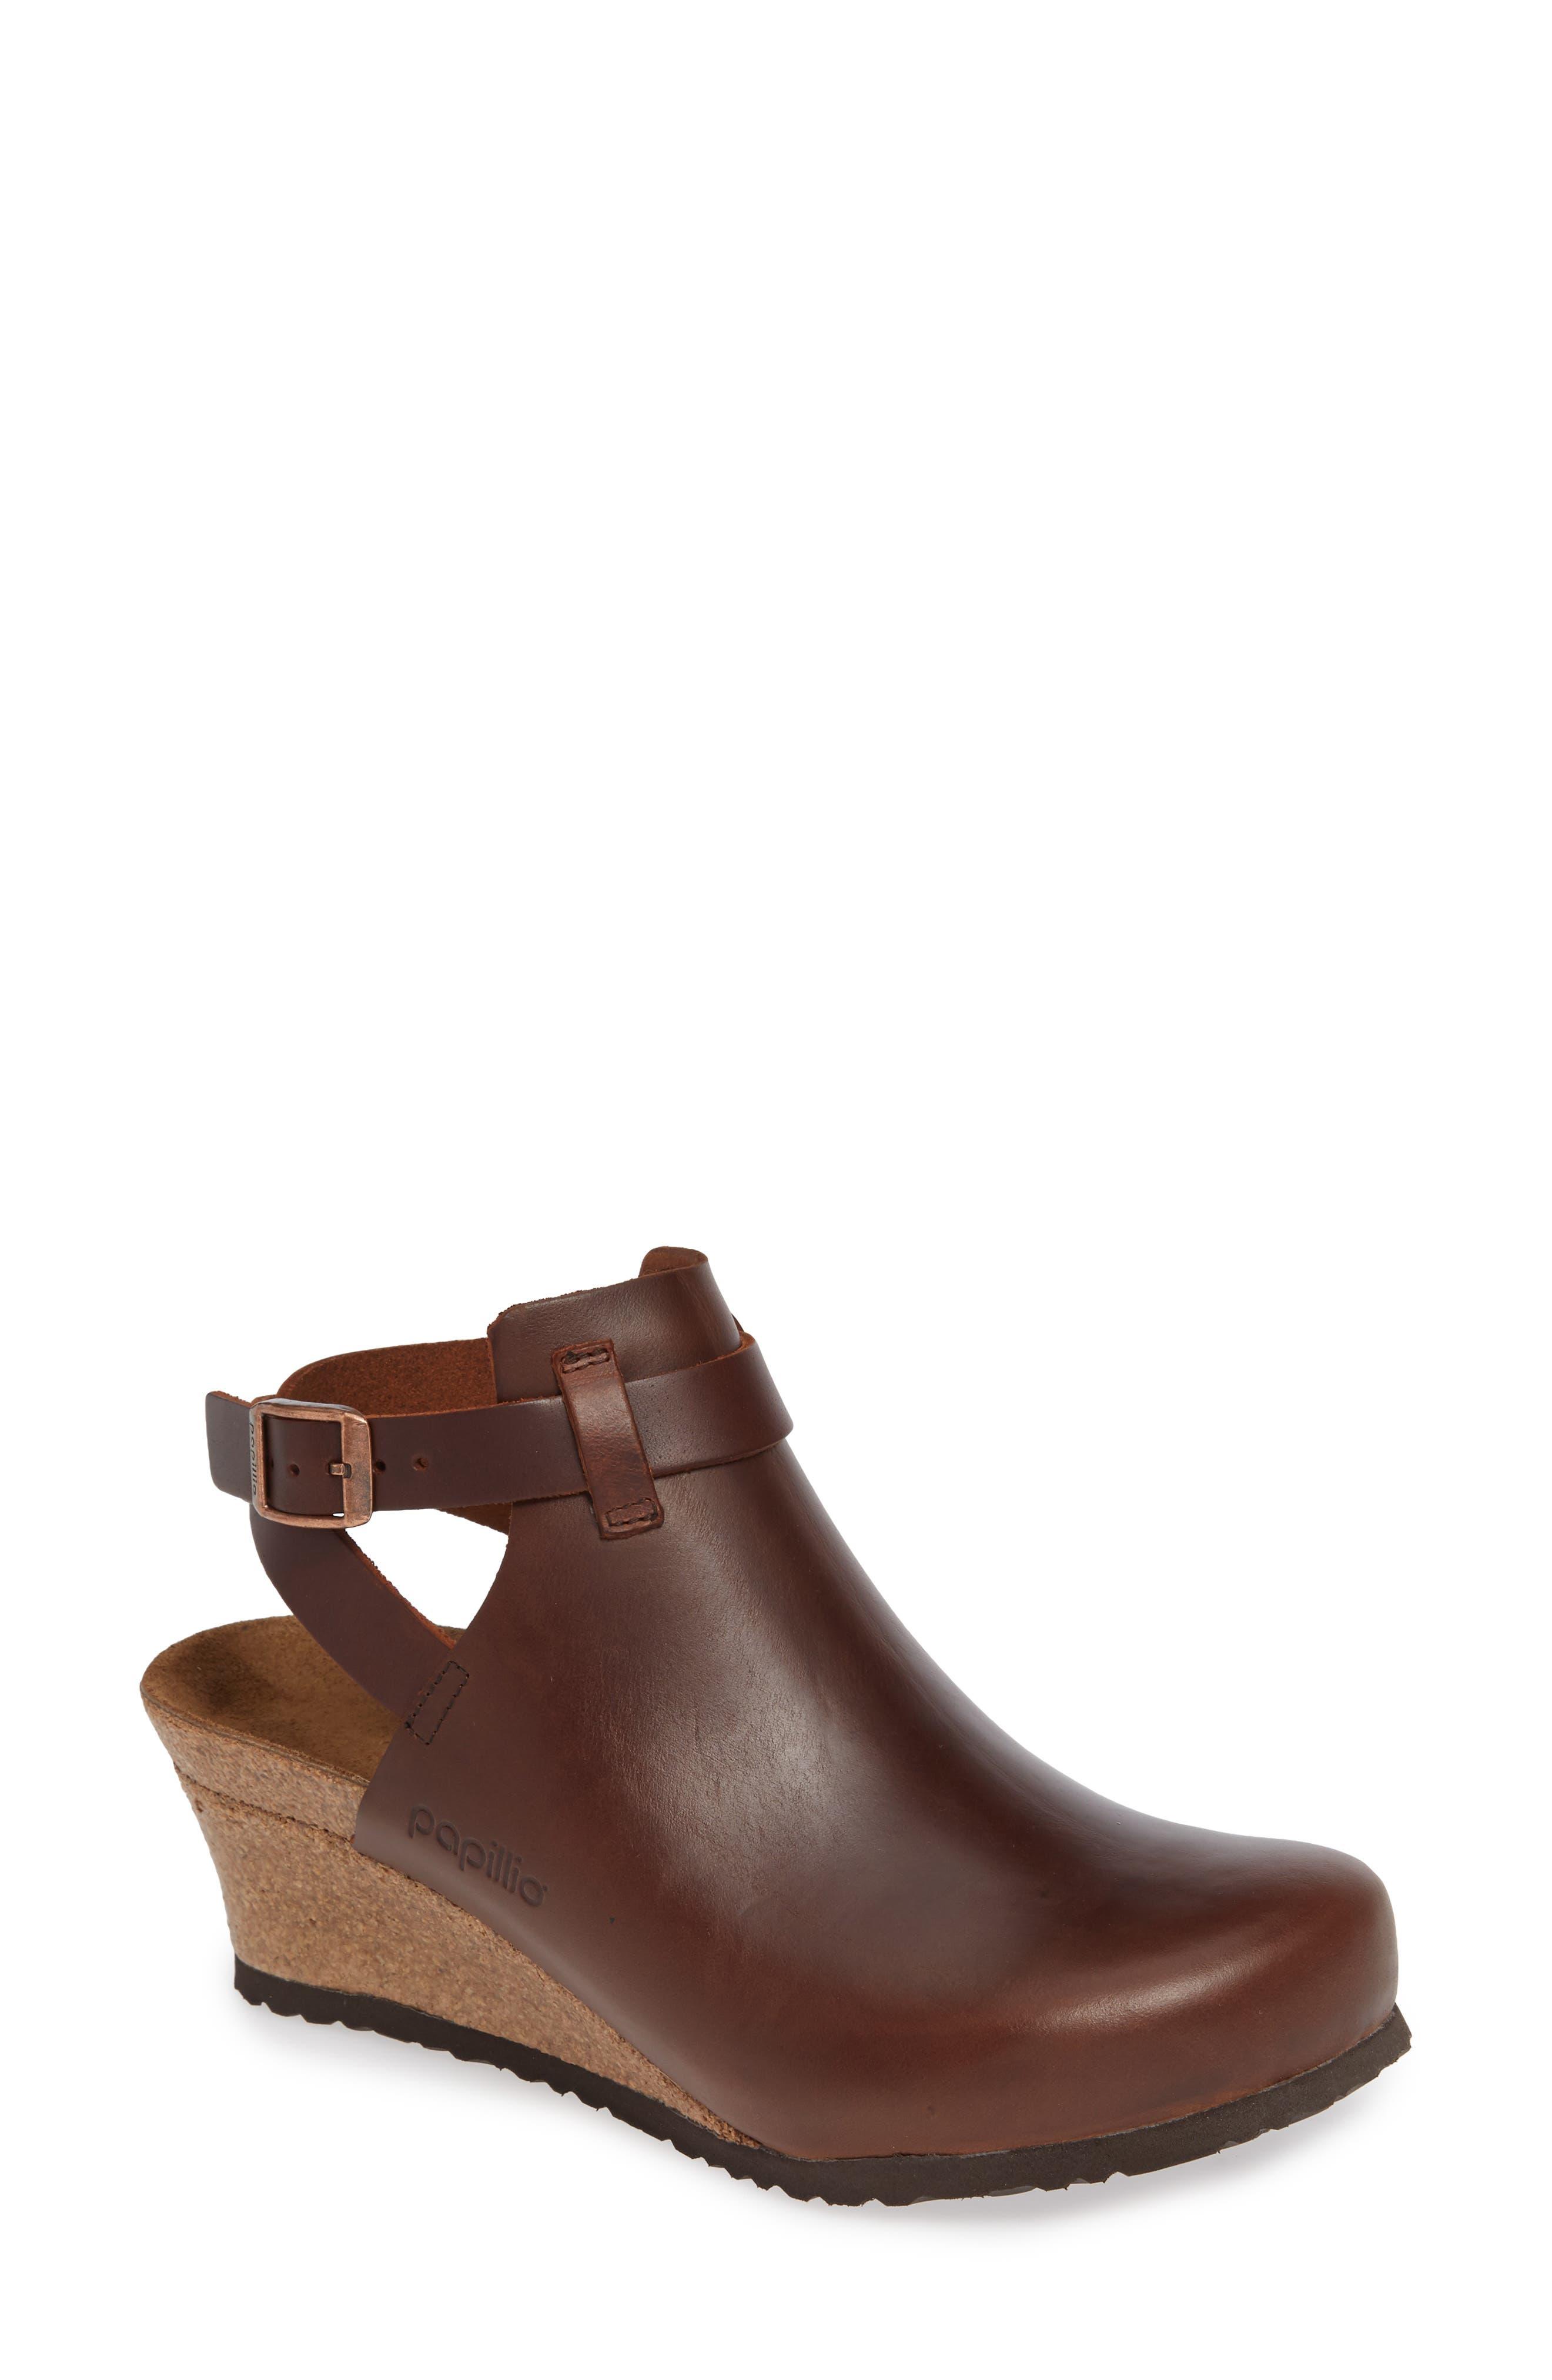 Esra Wedge Clog,                             Main thumbnail 1, color,                             Cognac Leather